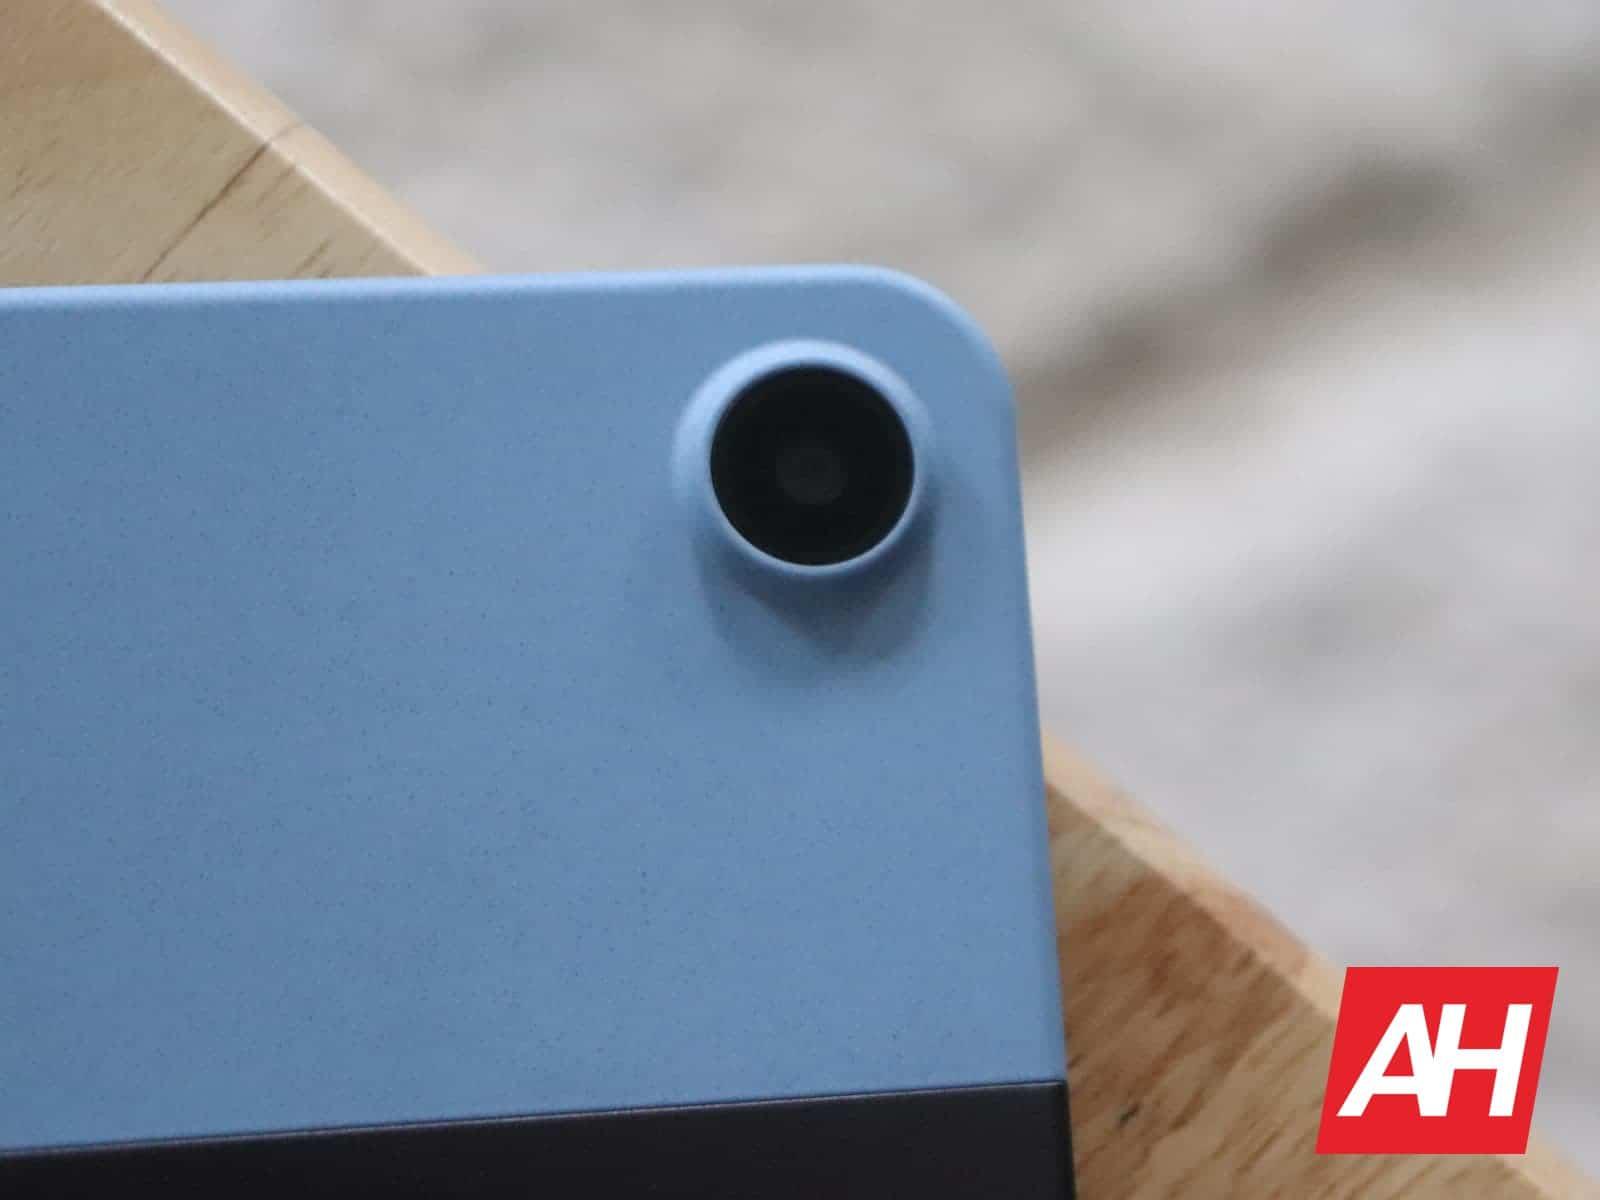 02 7 Lenovo IdeaPad Duet Hardware AH 2020